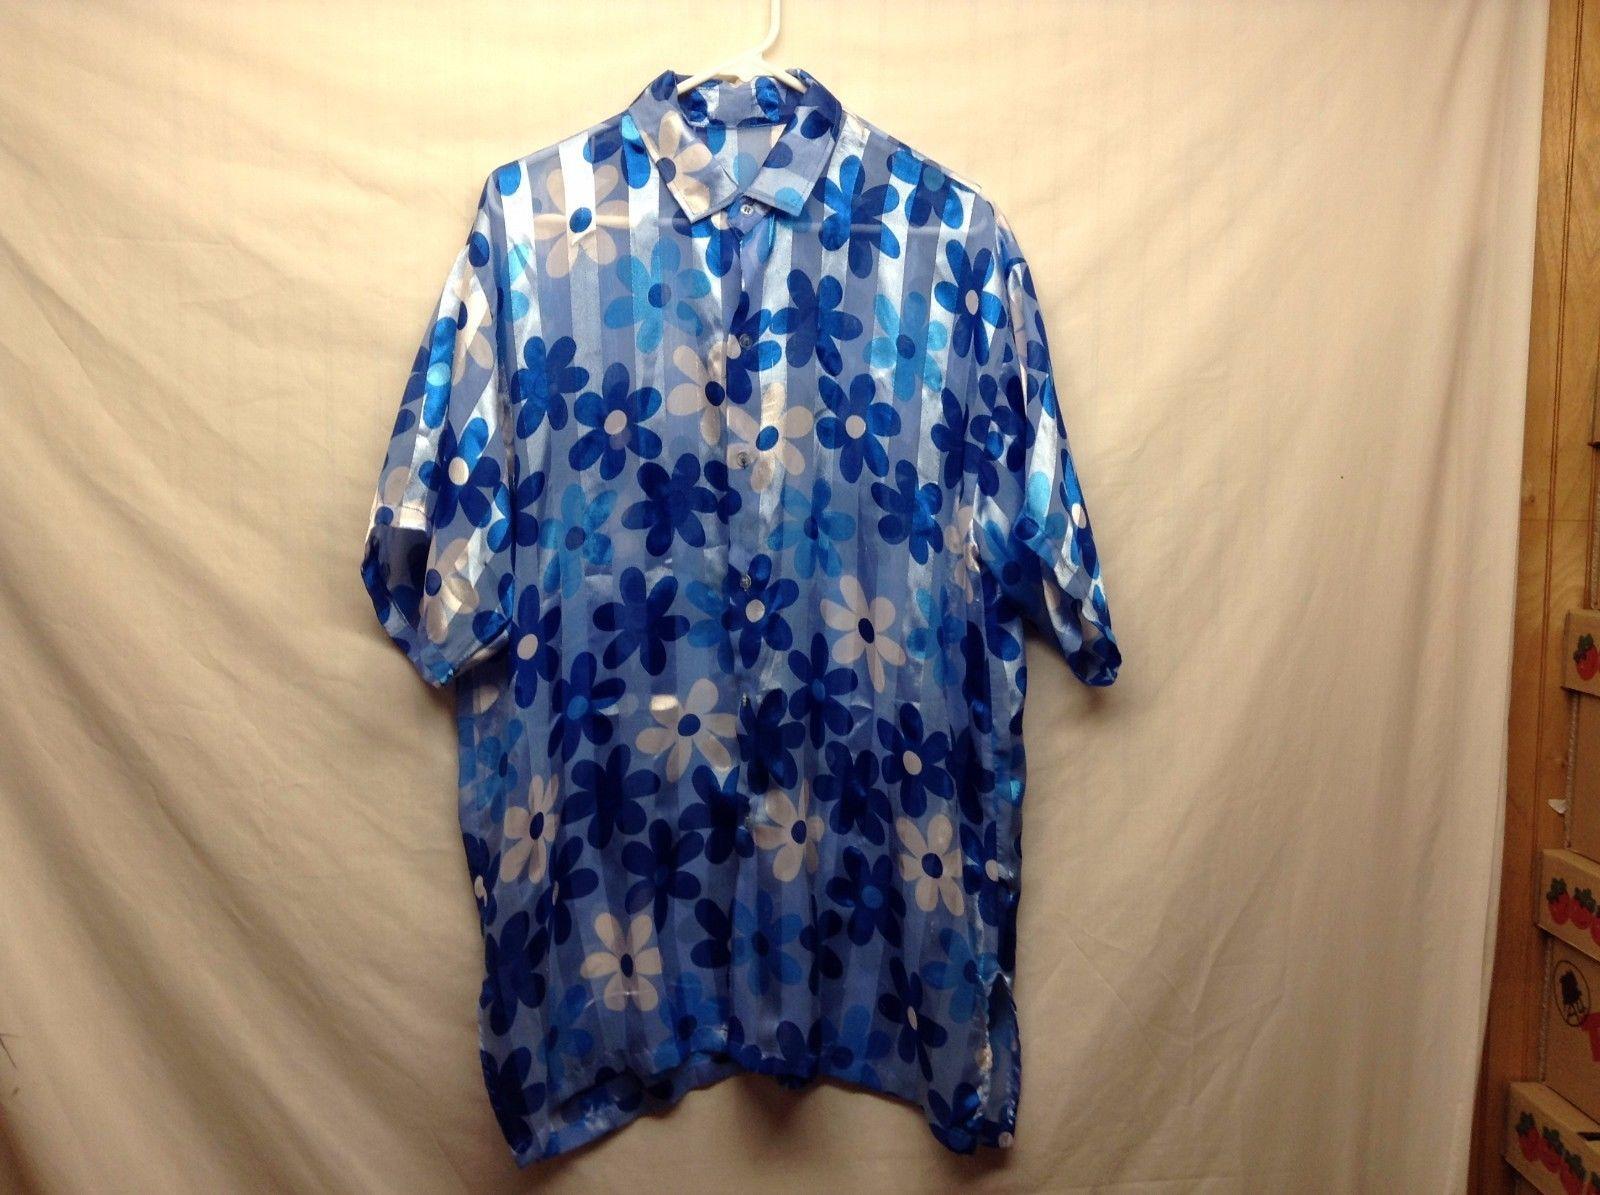 Very LG Dark/Light Blue w White Floral Design Short Sleeve Summer Shirt